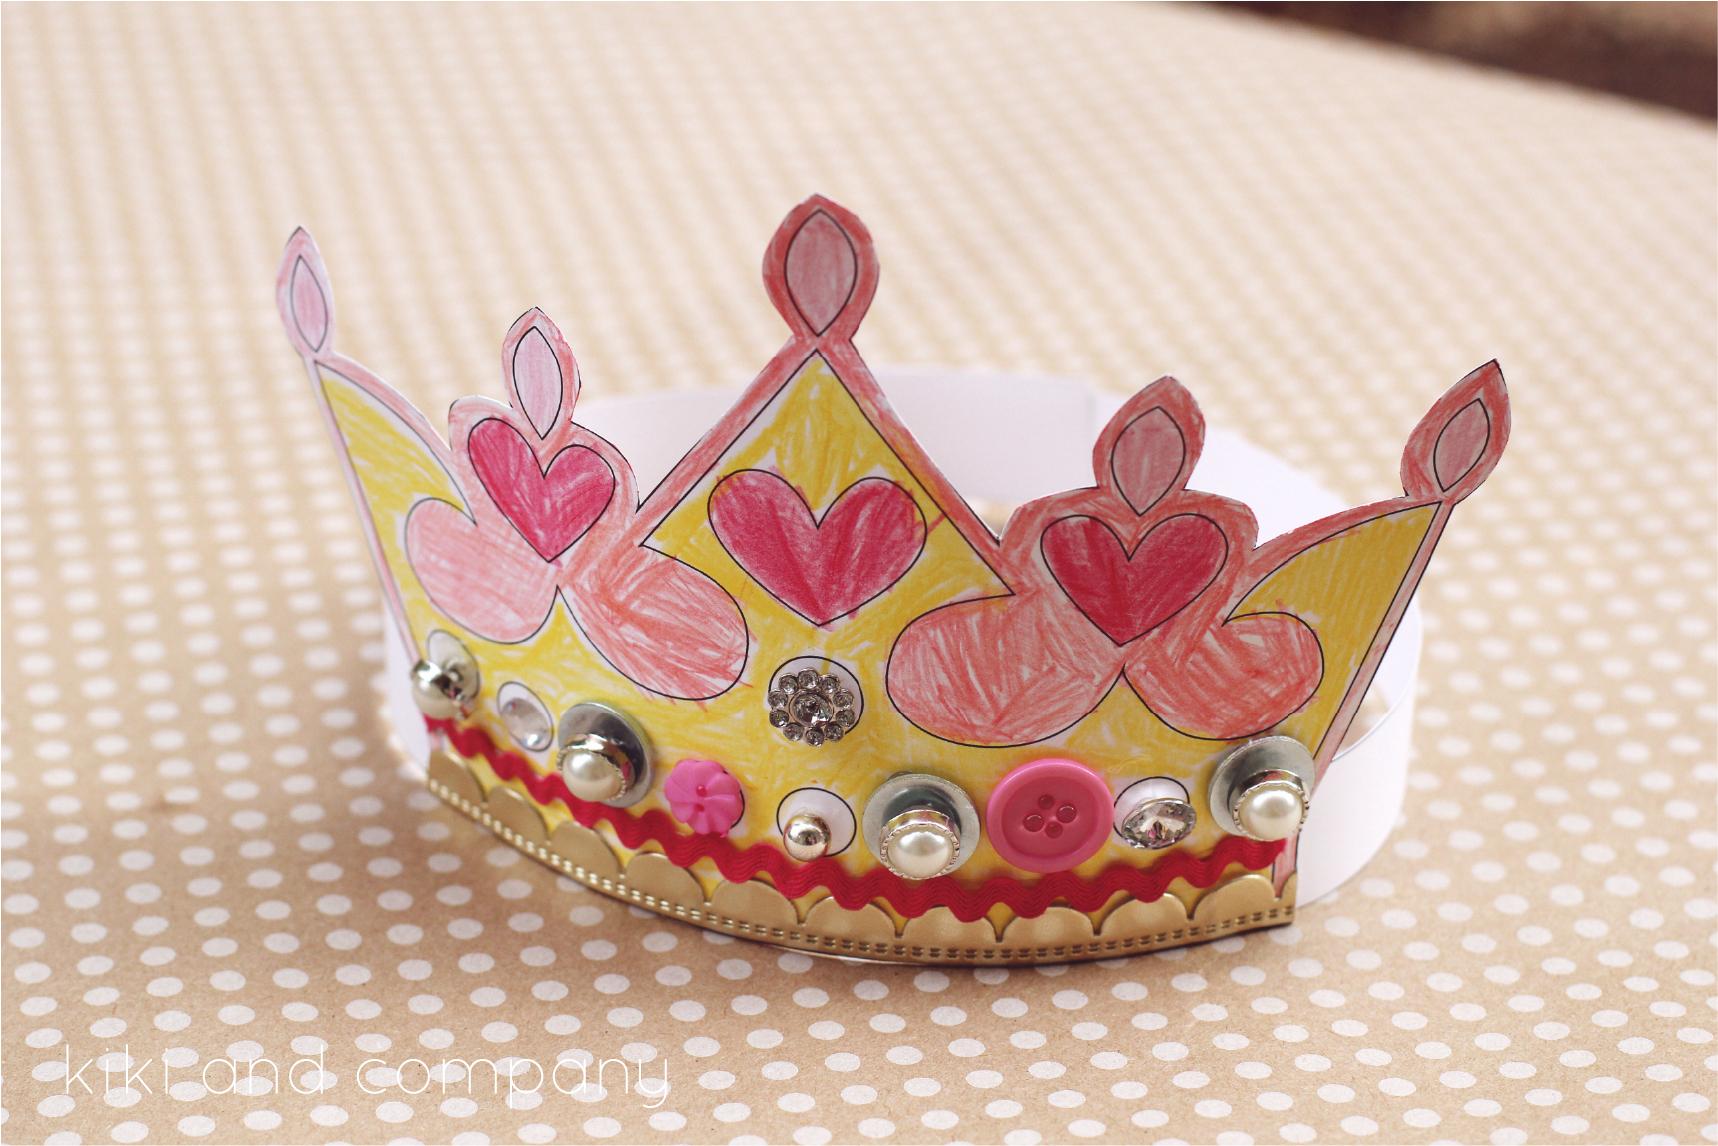 Printable Kings And Queens Crown {Free Printable} | Crafts | King - Free Printable Crown